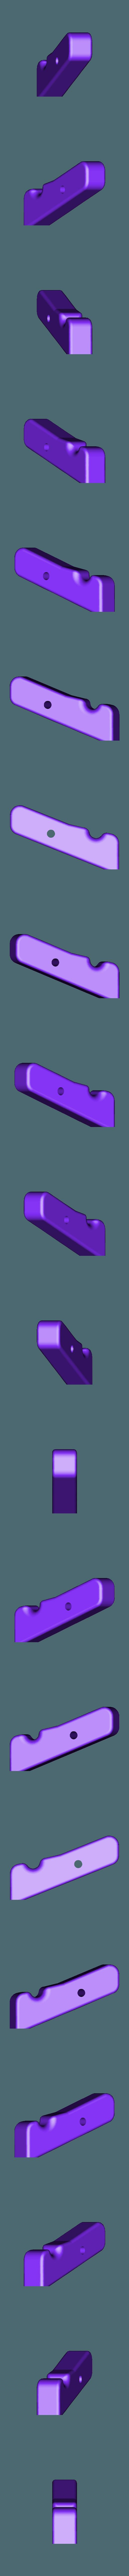 P-3.stl Download free STL file Laser Lifting Feet • 3D printing template, dancingchicken